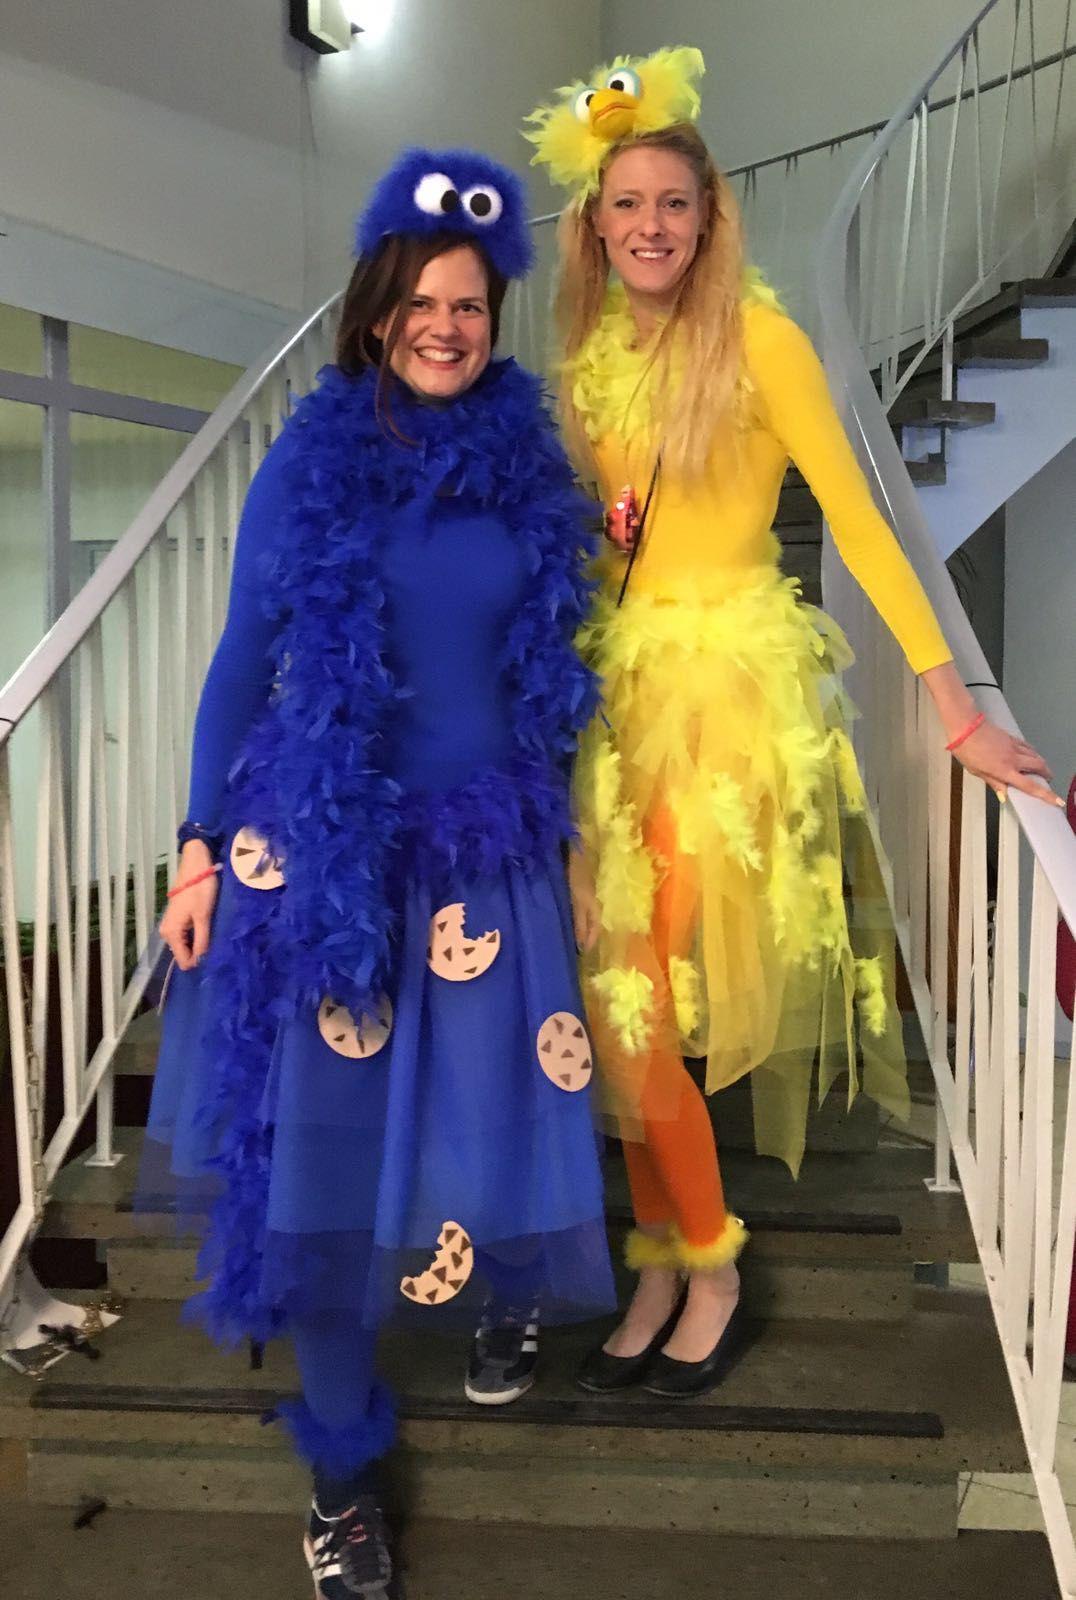 Krumelmonster Und Bibo Kostum Fasching Halloween Costumes